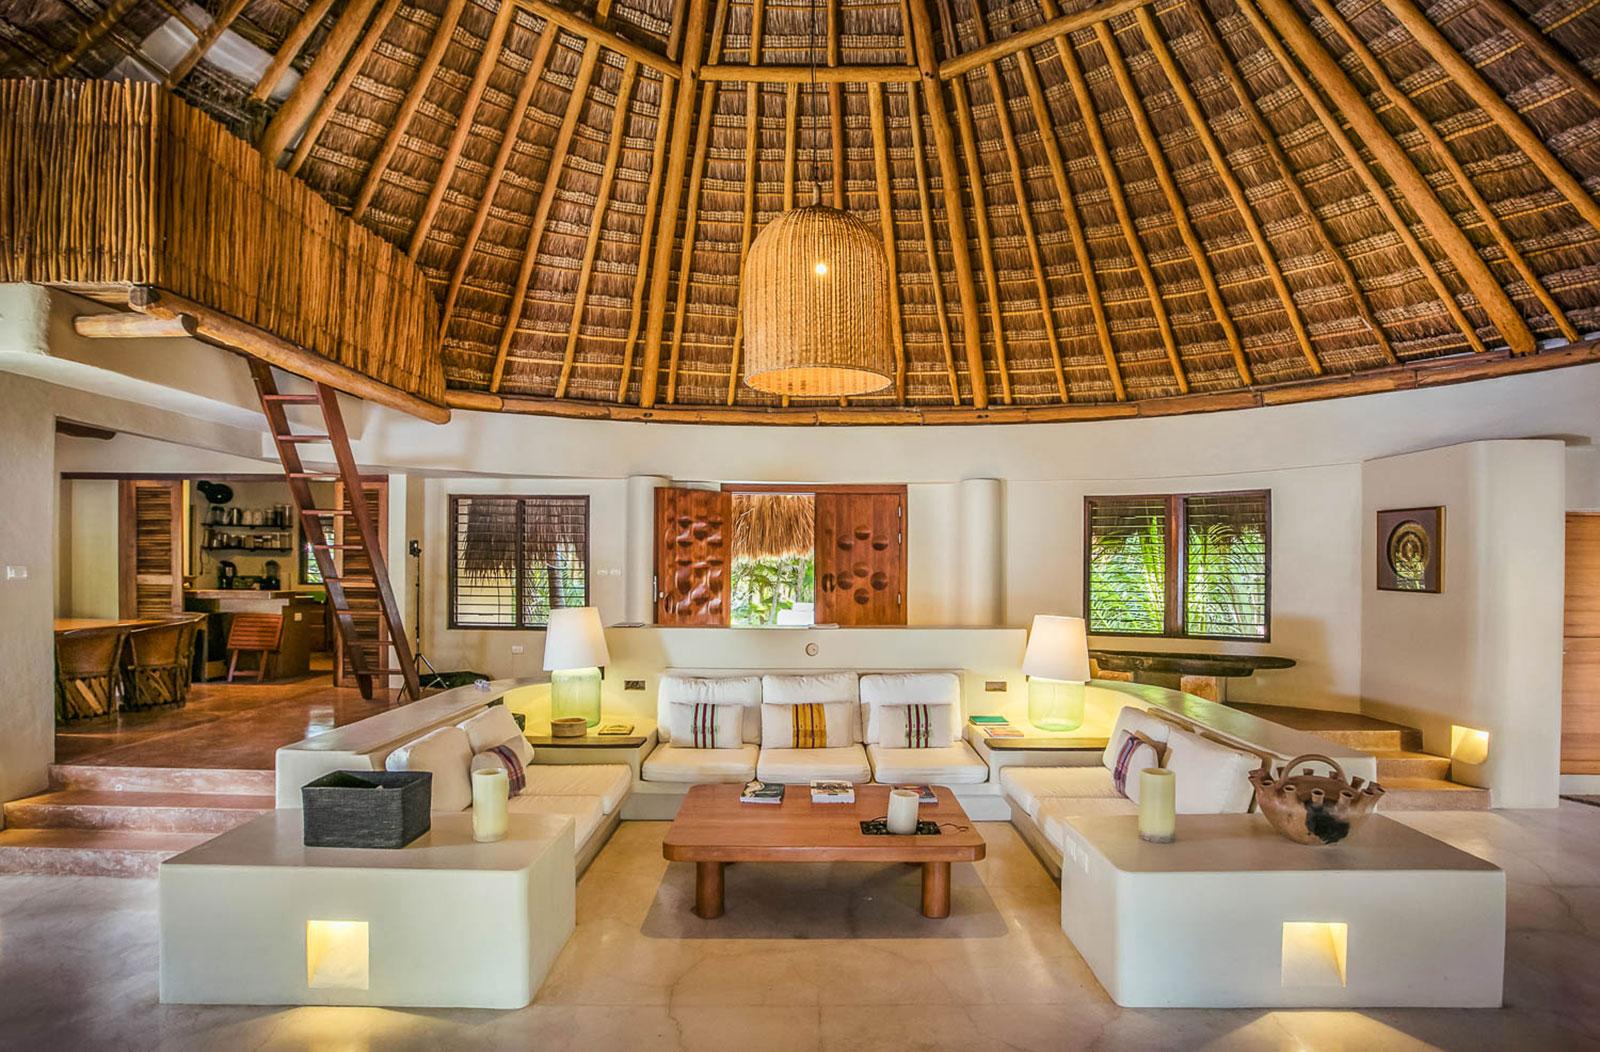 Maya_Luxe_Riviera_Maya_Luxury_Villas_Experiences_Sian_Kaan_5_Bedrooms_Casa_Nalum_9 (1).jpg